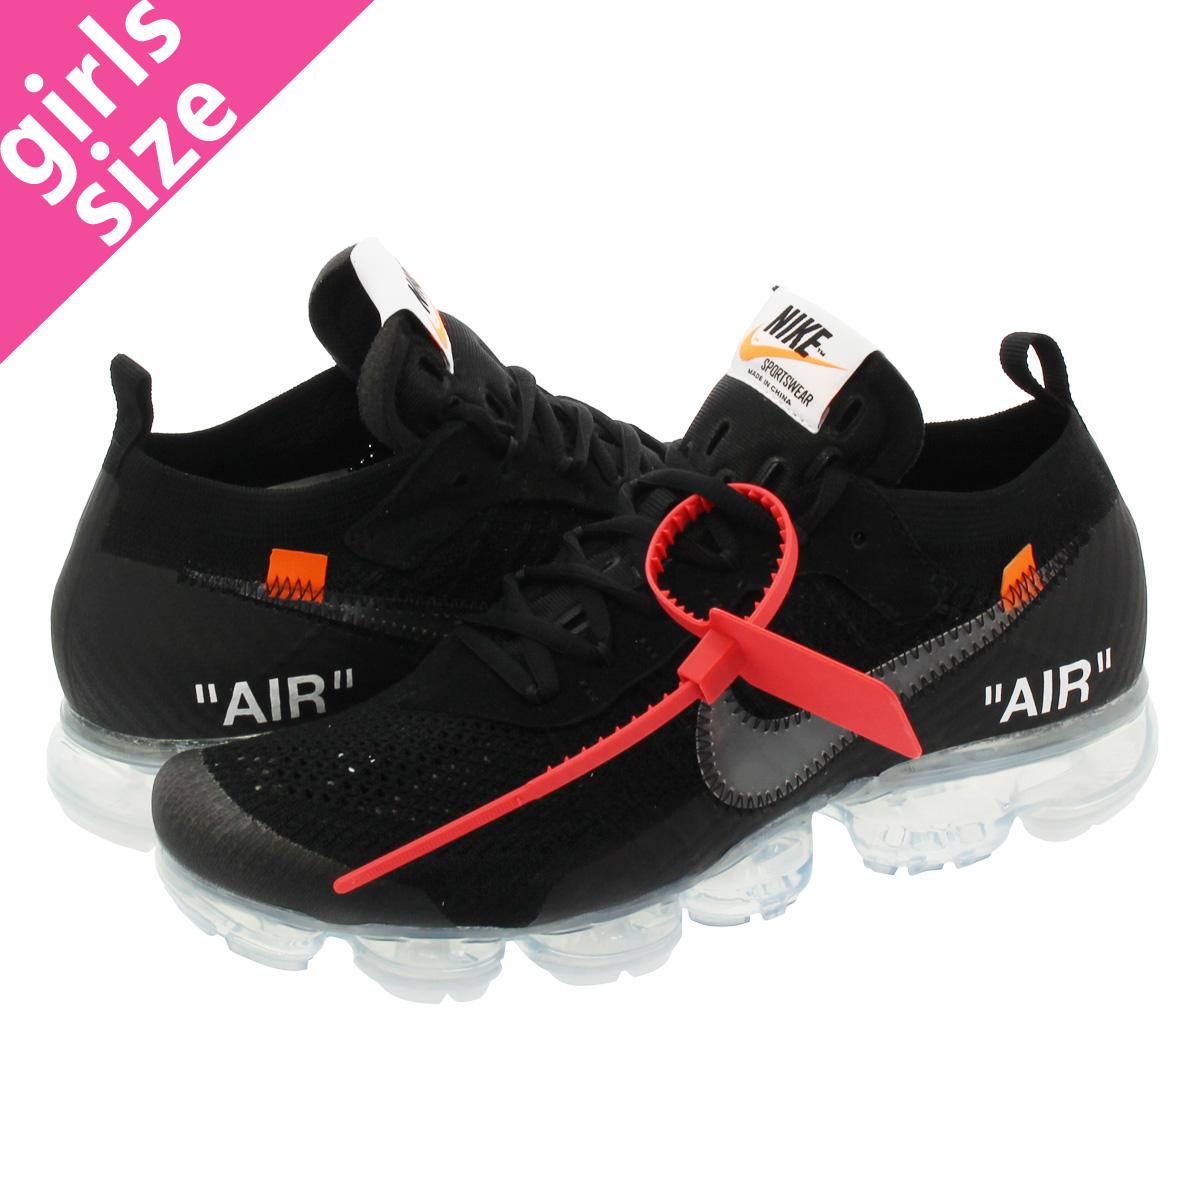 1243e63b708bf NIKE AIR VAPORMAX FLYKNIT Nike air vapor max fried food knit WHITE TOTAL  CRIMSON BLACK aa3831-002